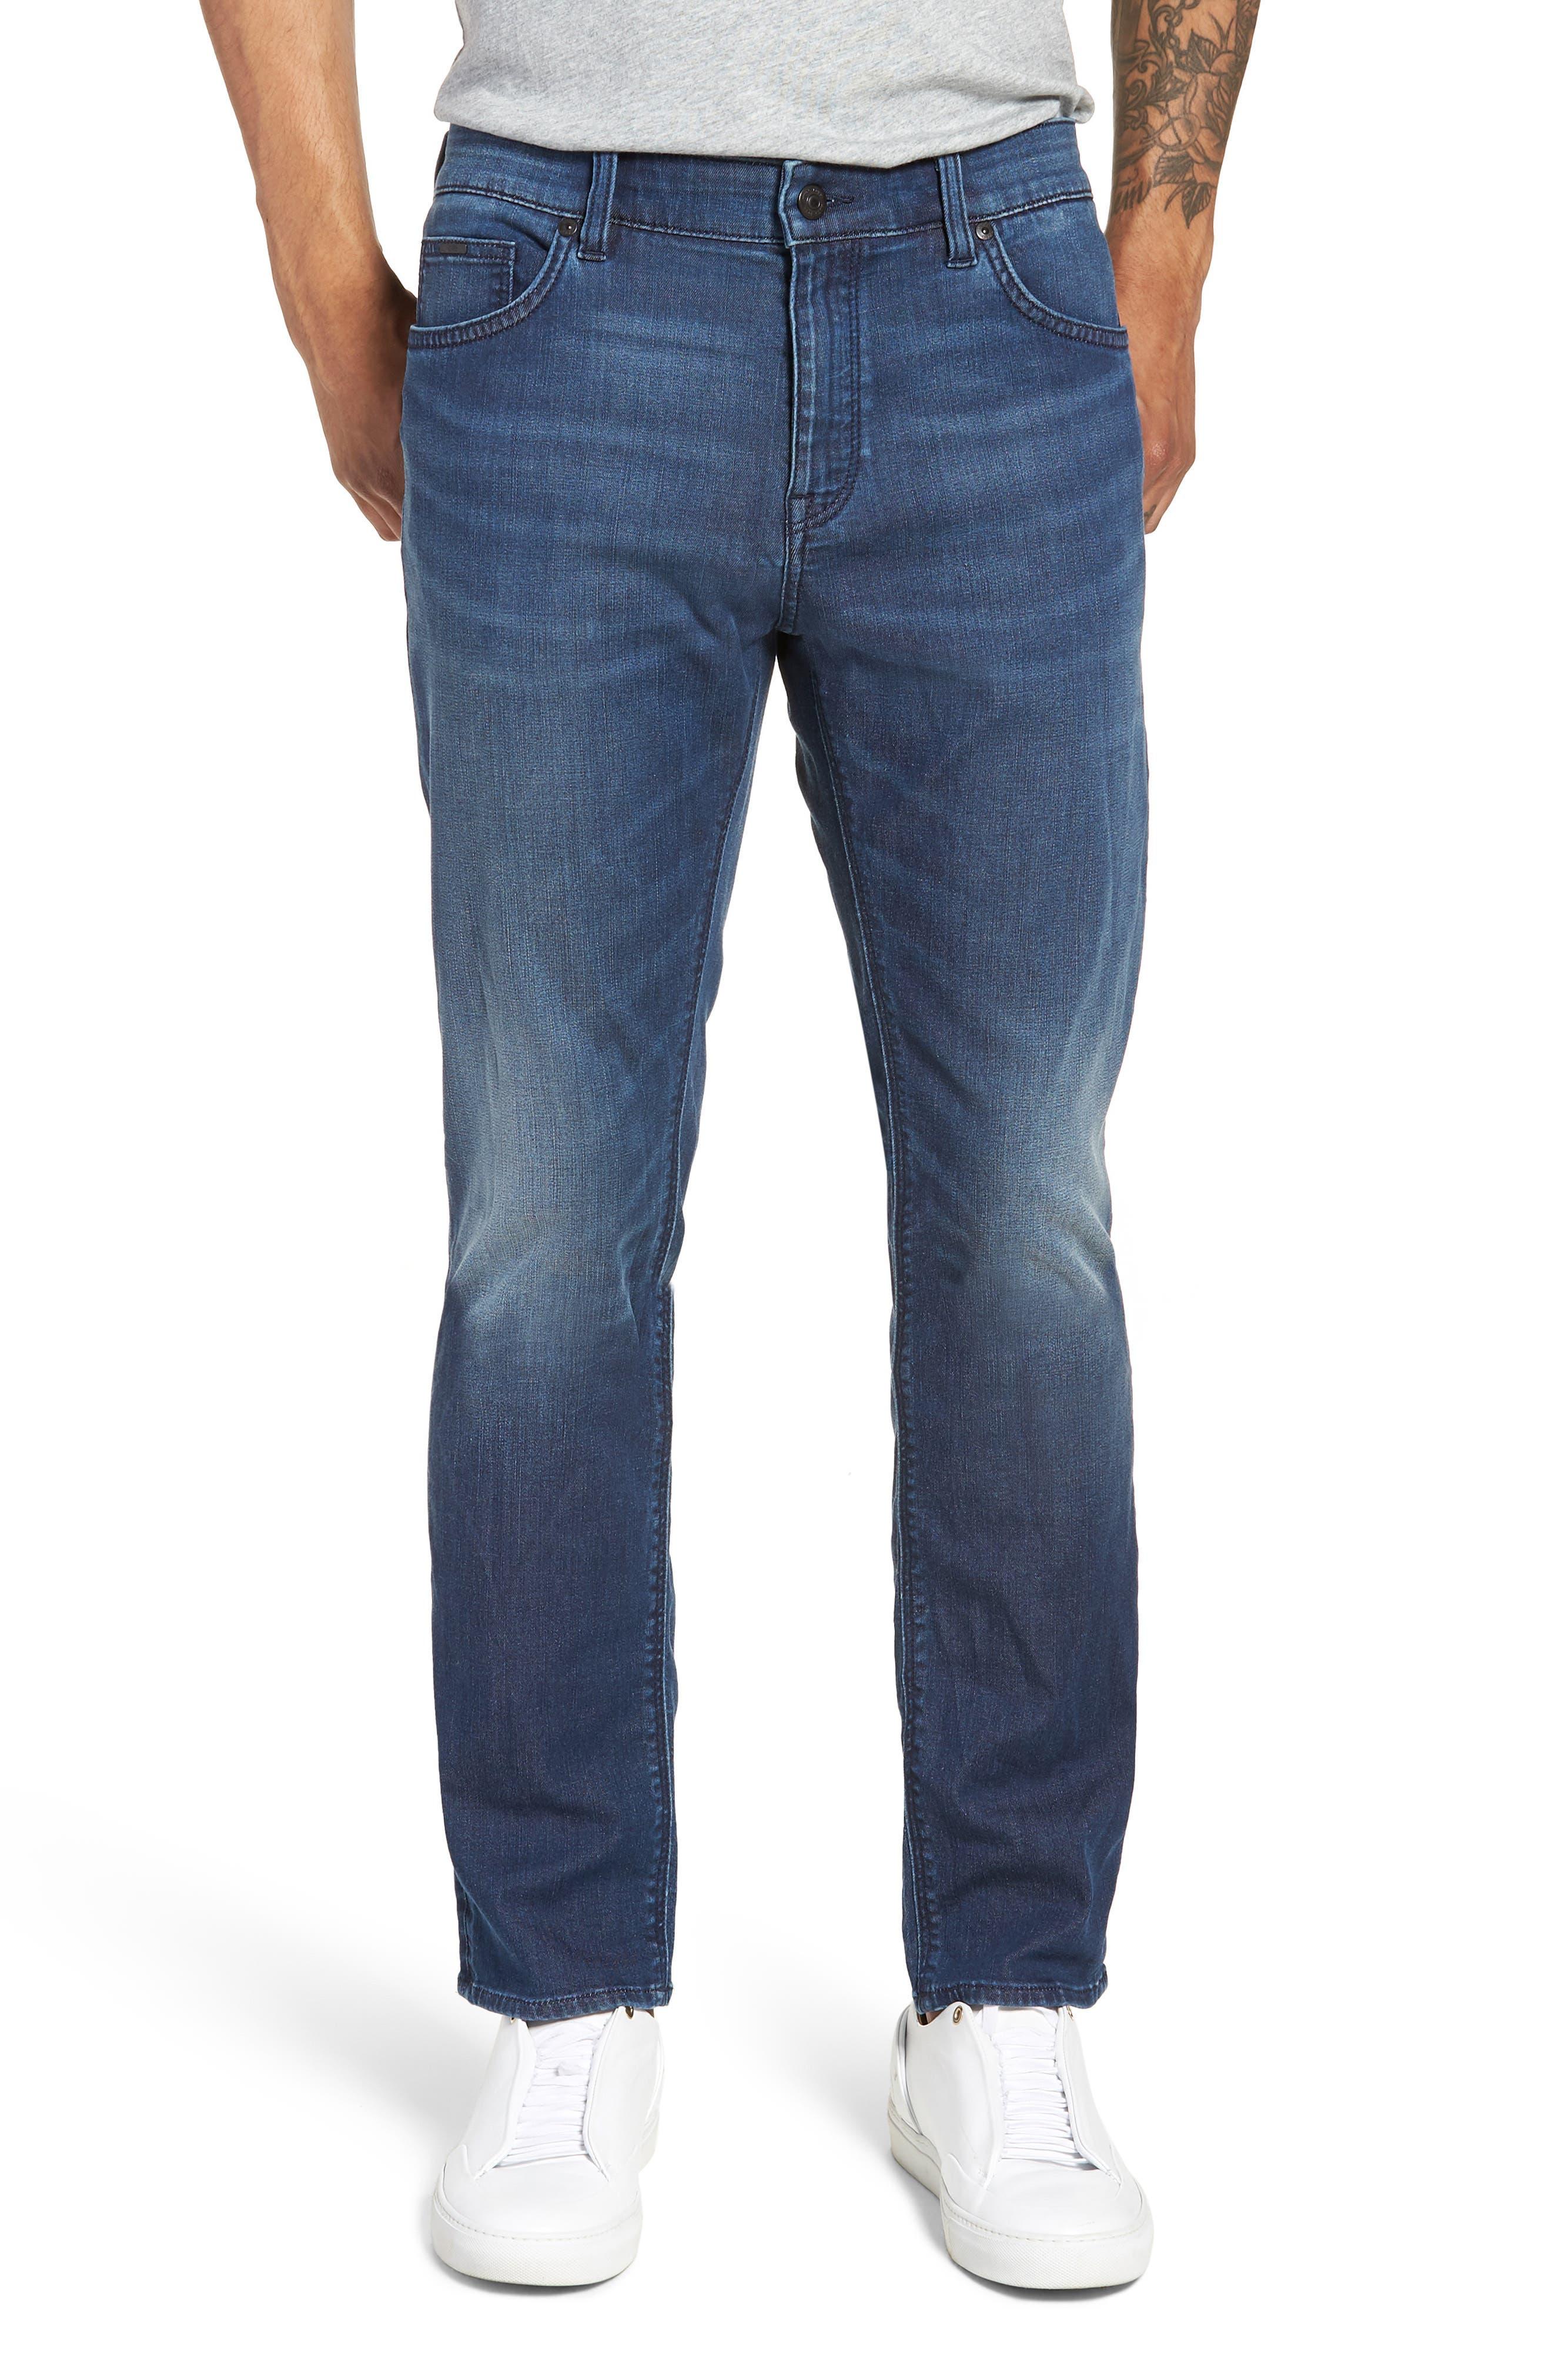 Maine Straight Leg Jeans,                             Main thumbnail 1, color,                             Blue